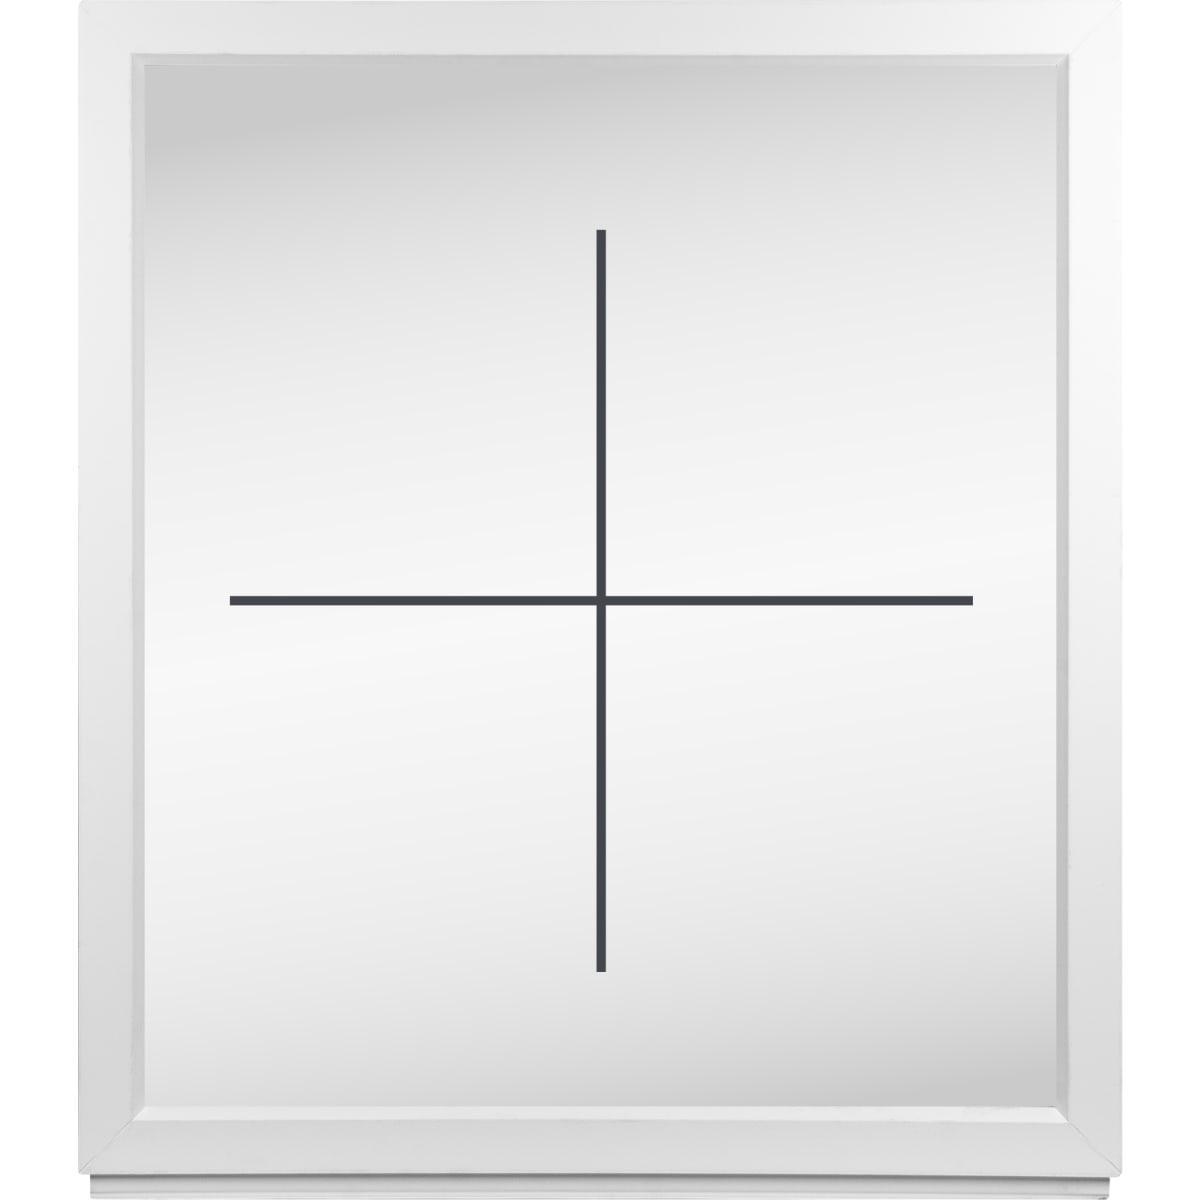 Окно ПВХ одностворчатое 116х100 см глухое